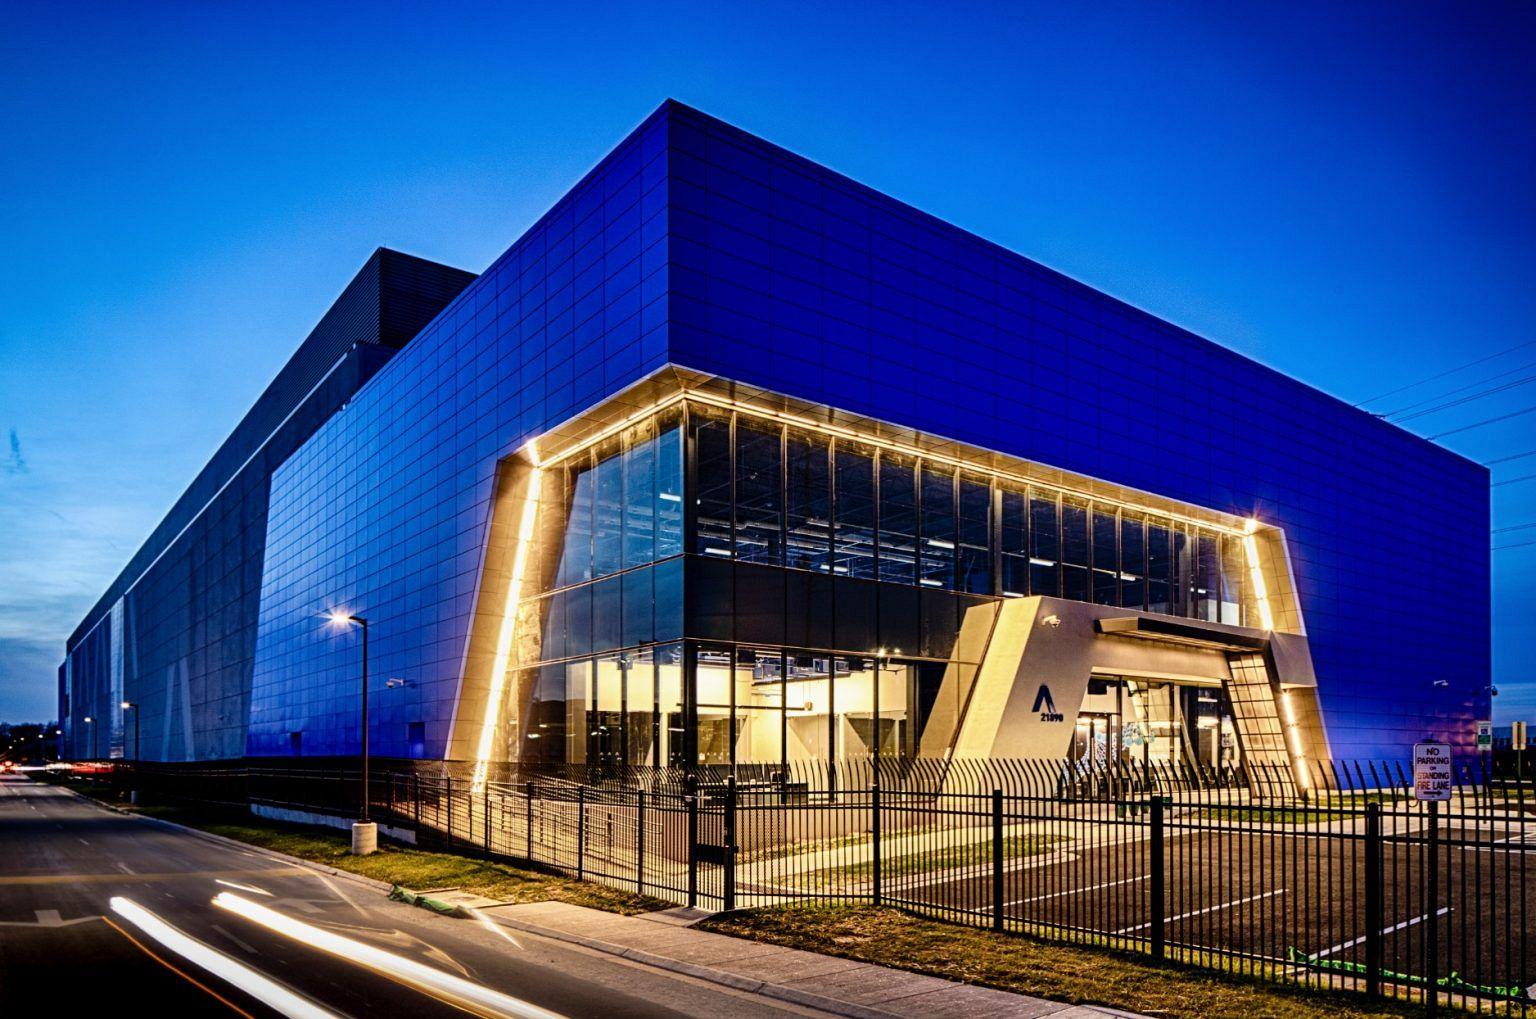 Aligned data center campus Ashburn, VA